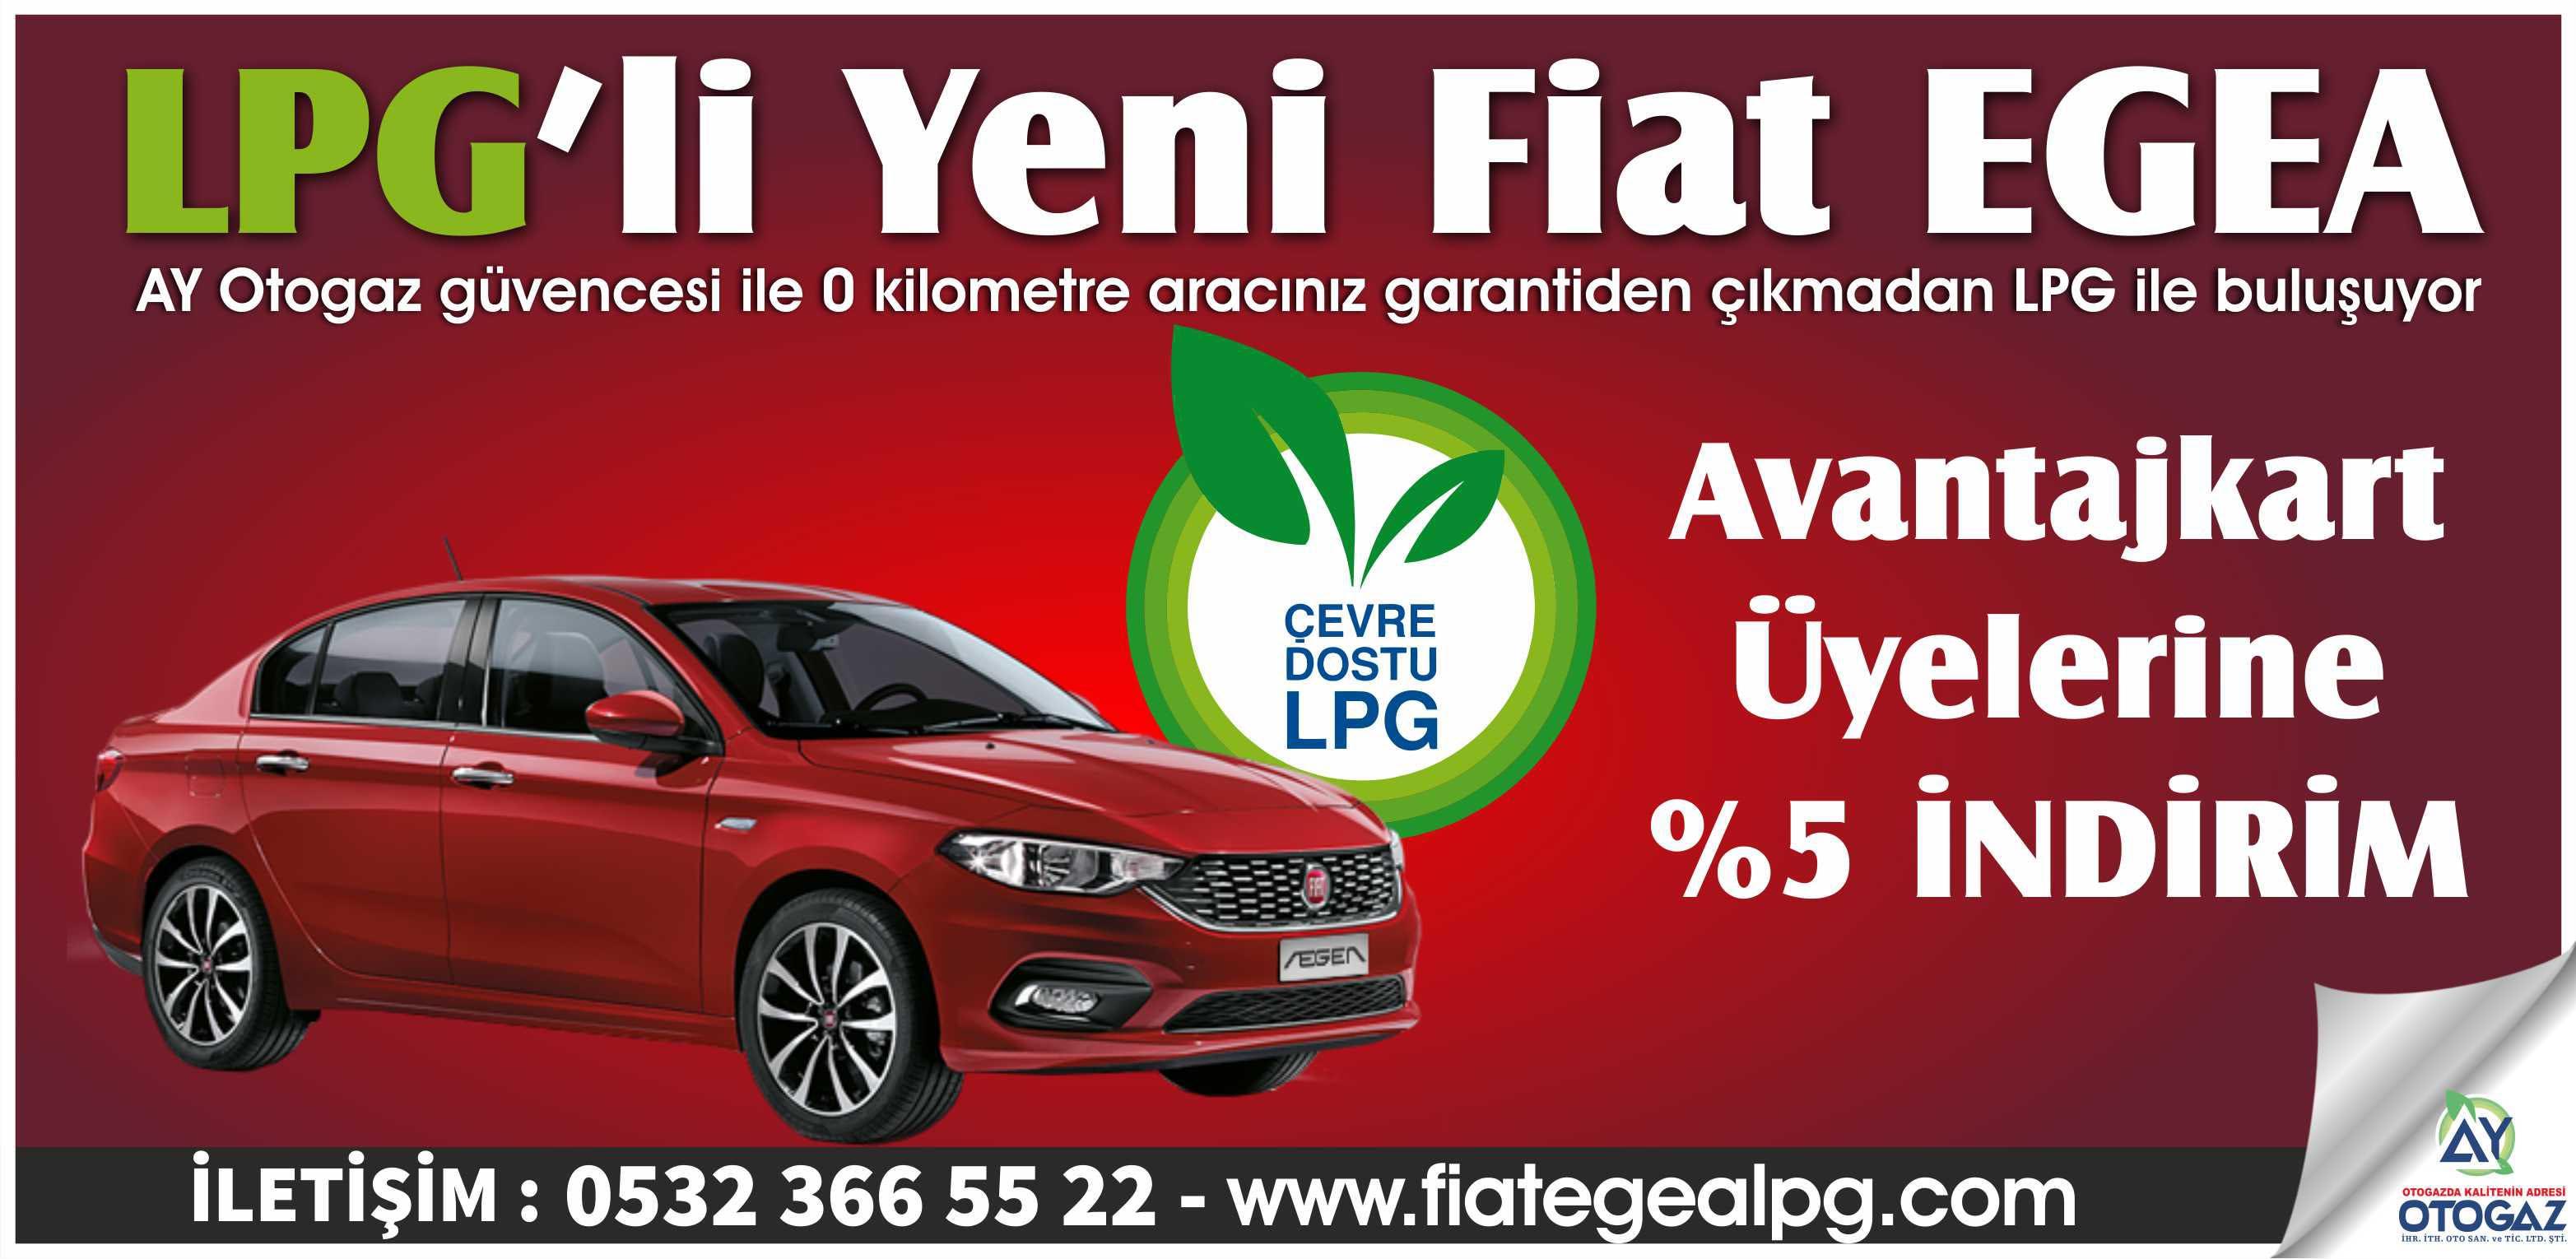 FIAT EGEA LPG'Lİ AVANTAJKART ÖZEL İNDİRİMLİ